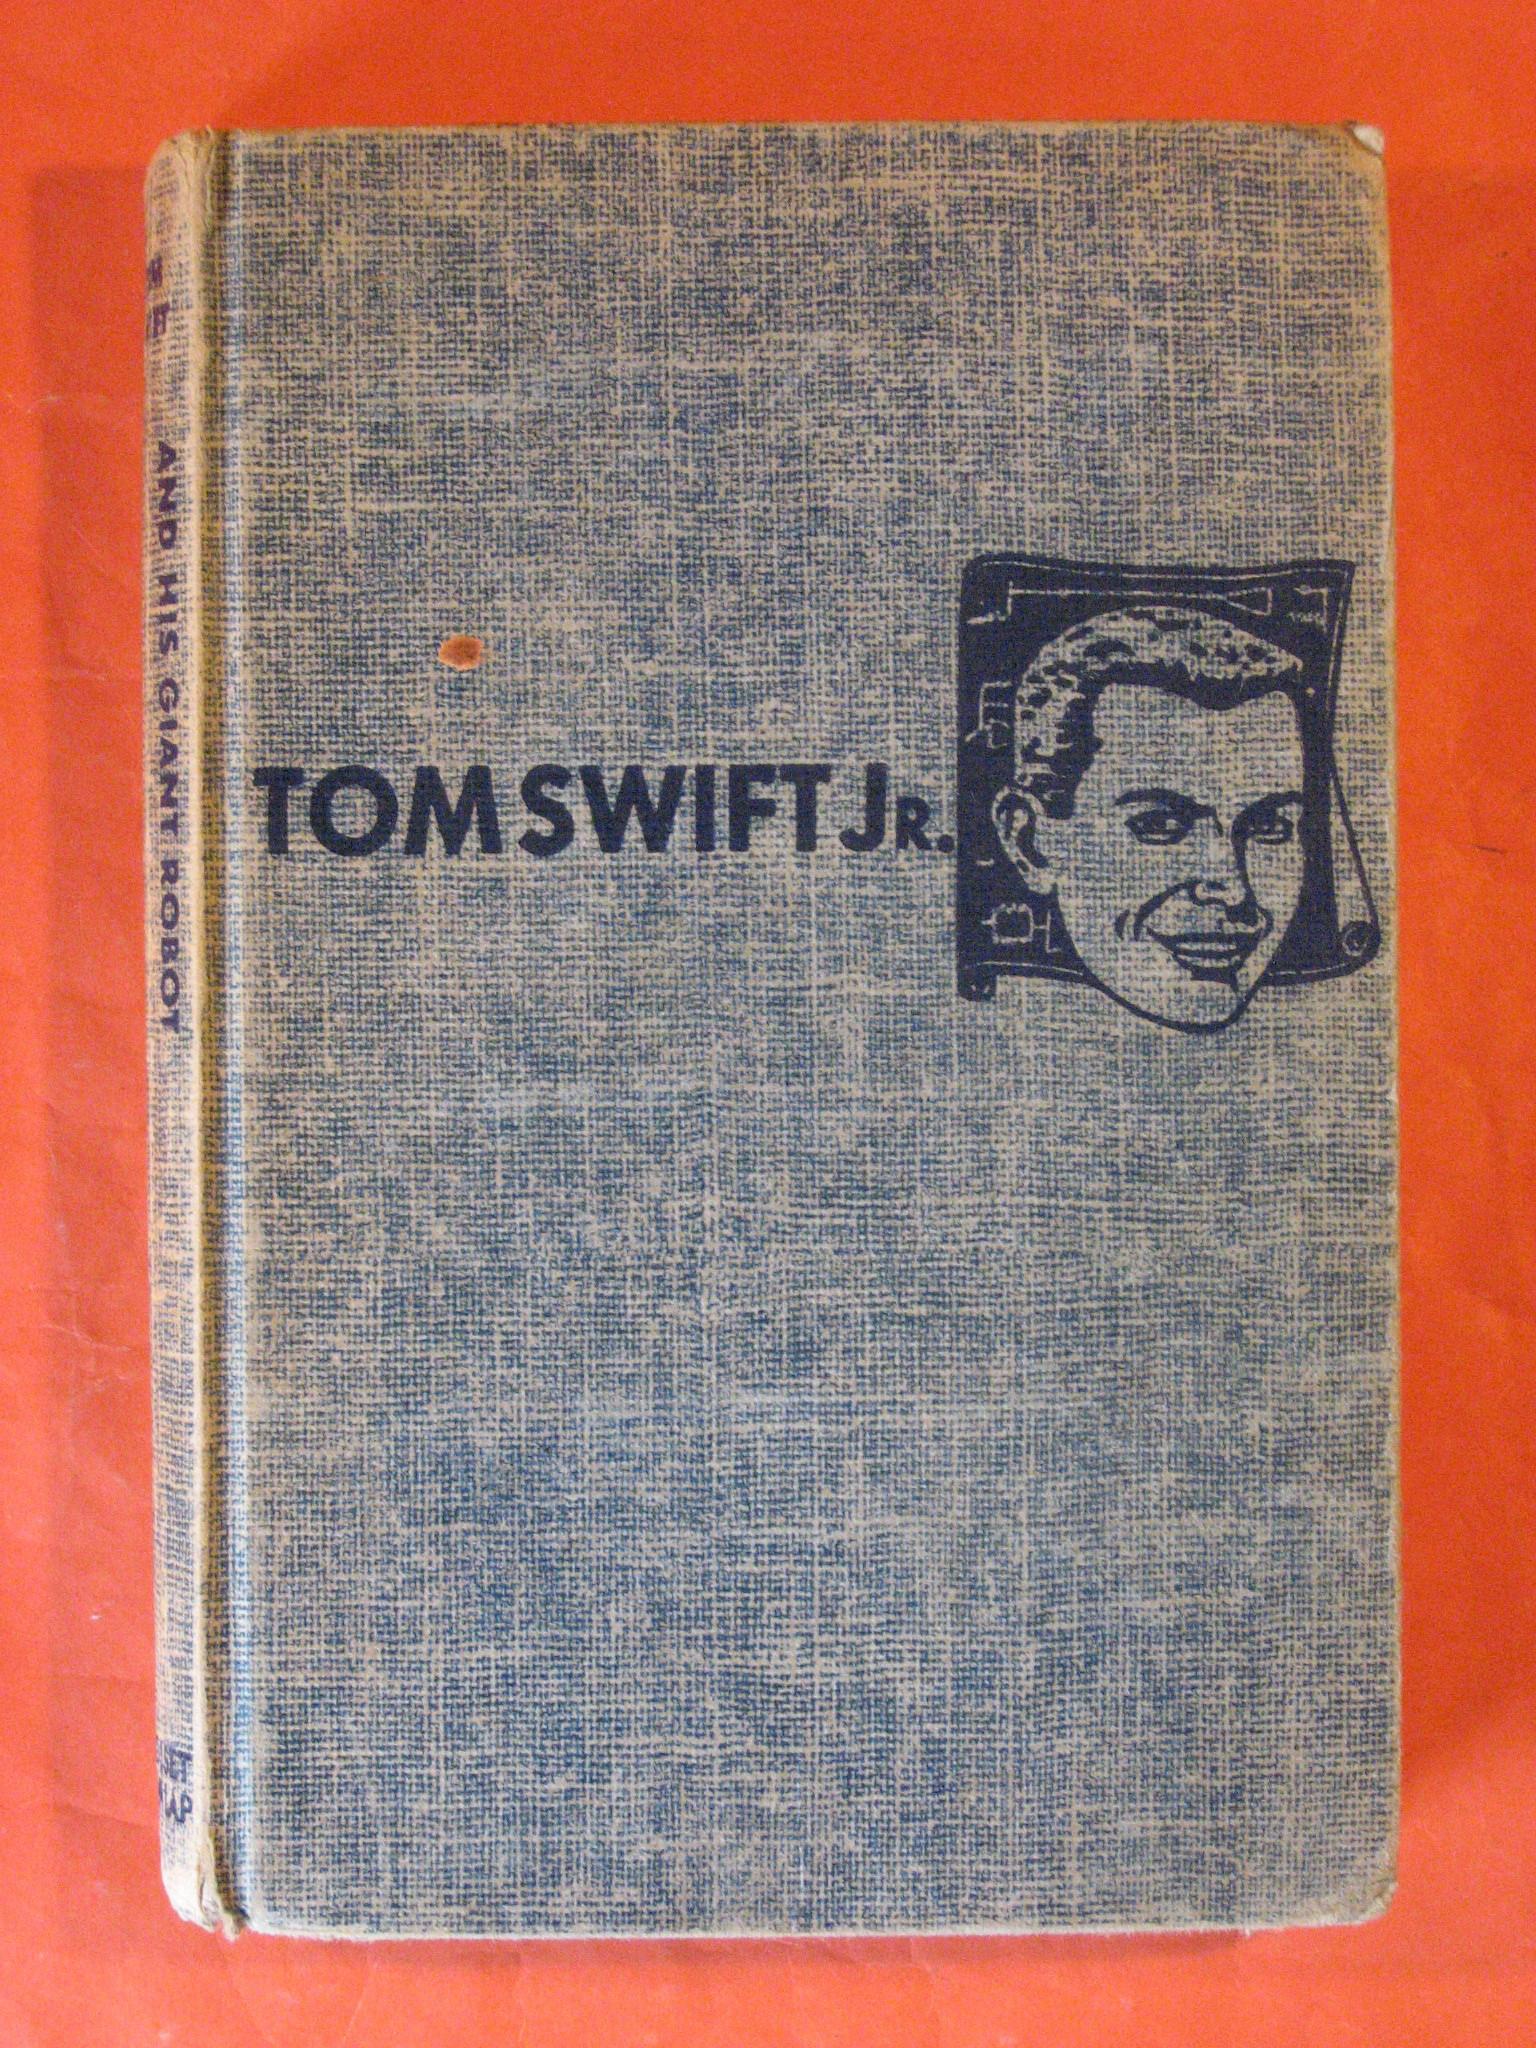 Tom Swift and His Giant Robot, Appleton II, Victor